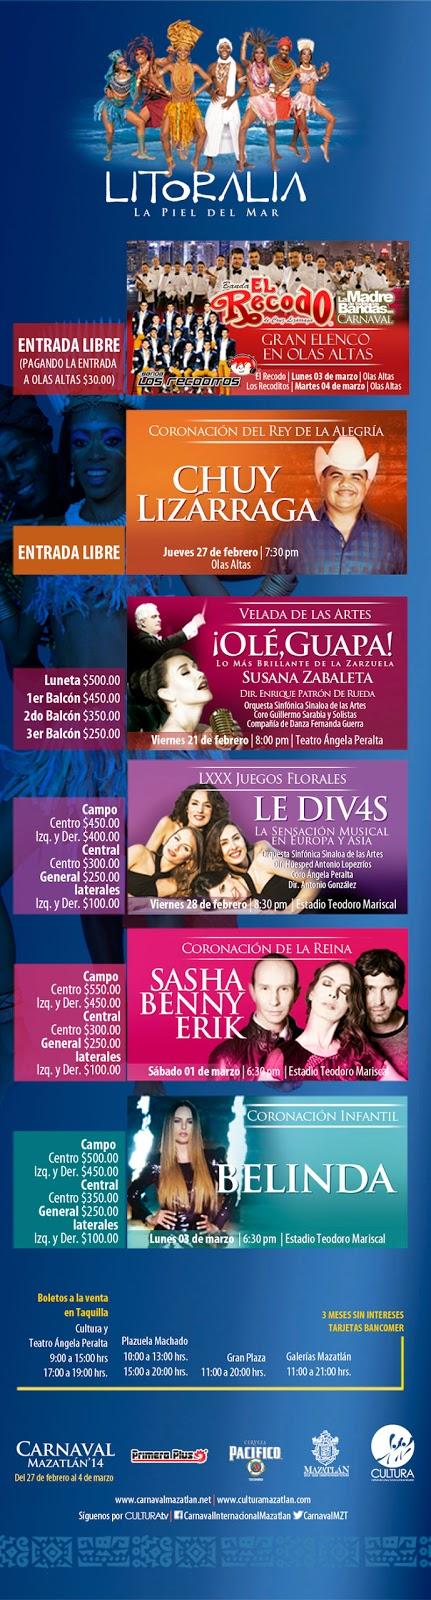 Programa Carnaval Mazatlán 2014